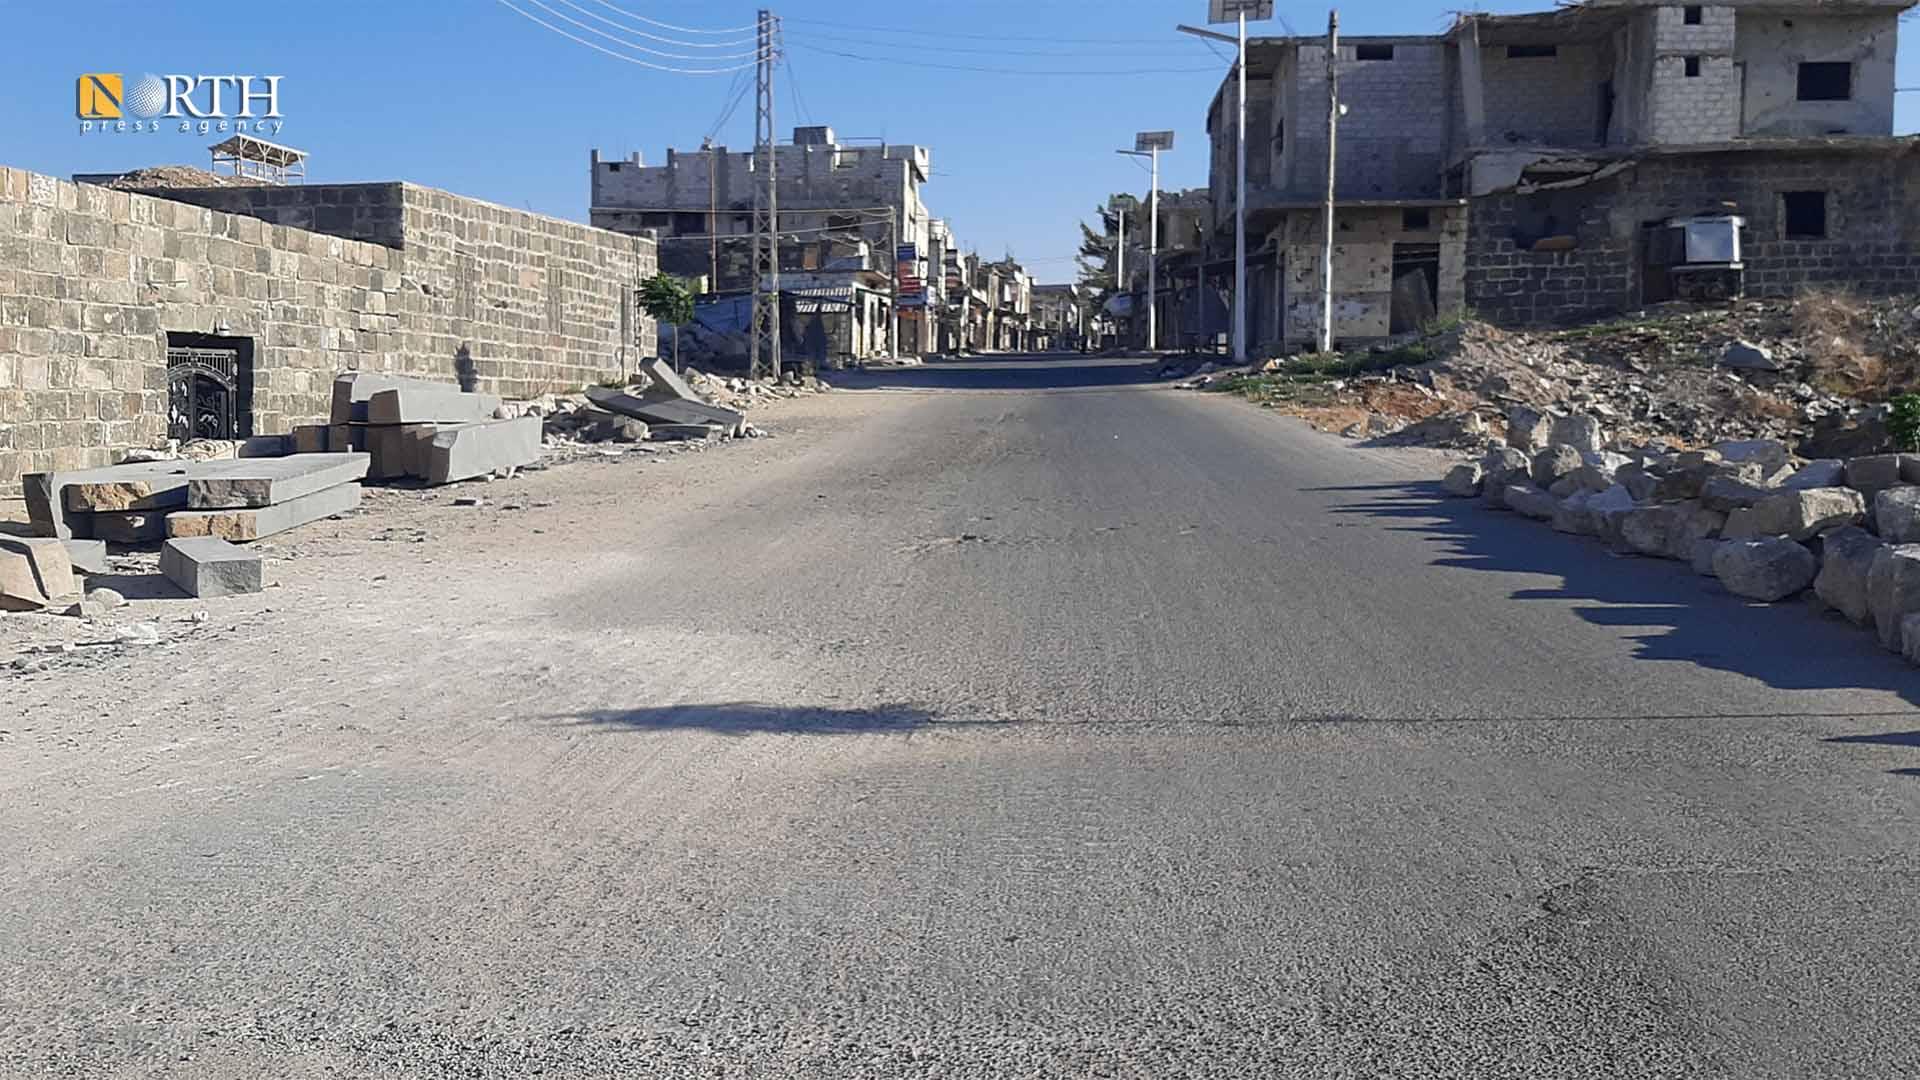 The vicinity of al-Omari Mosque in Daraa al-Balad – North Press/archive